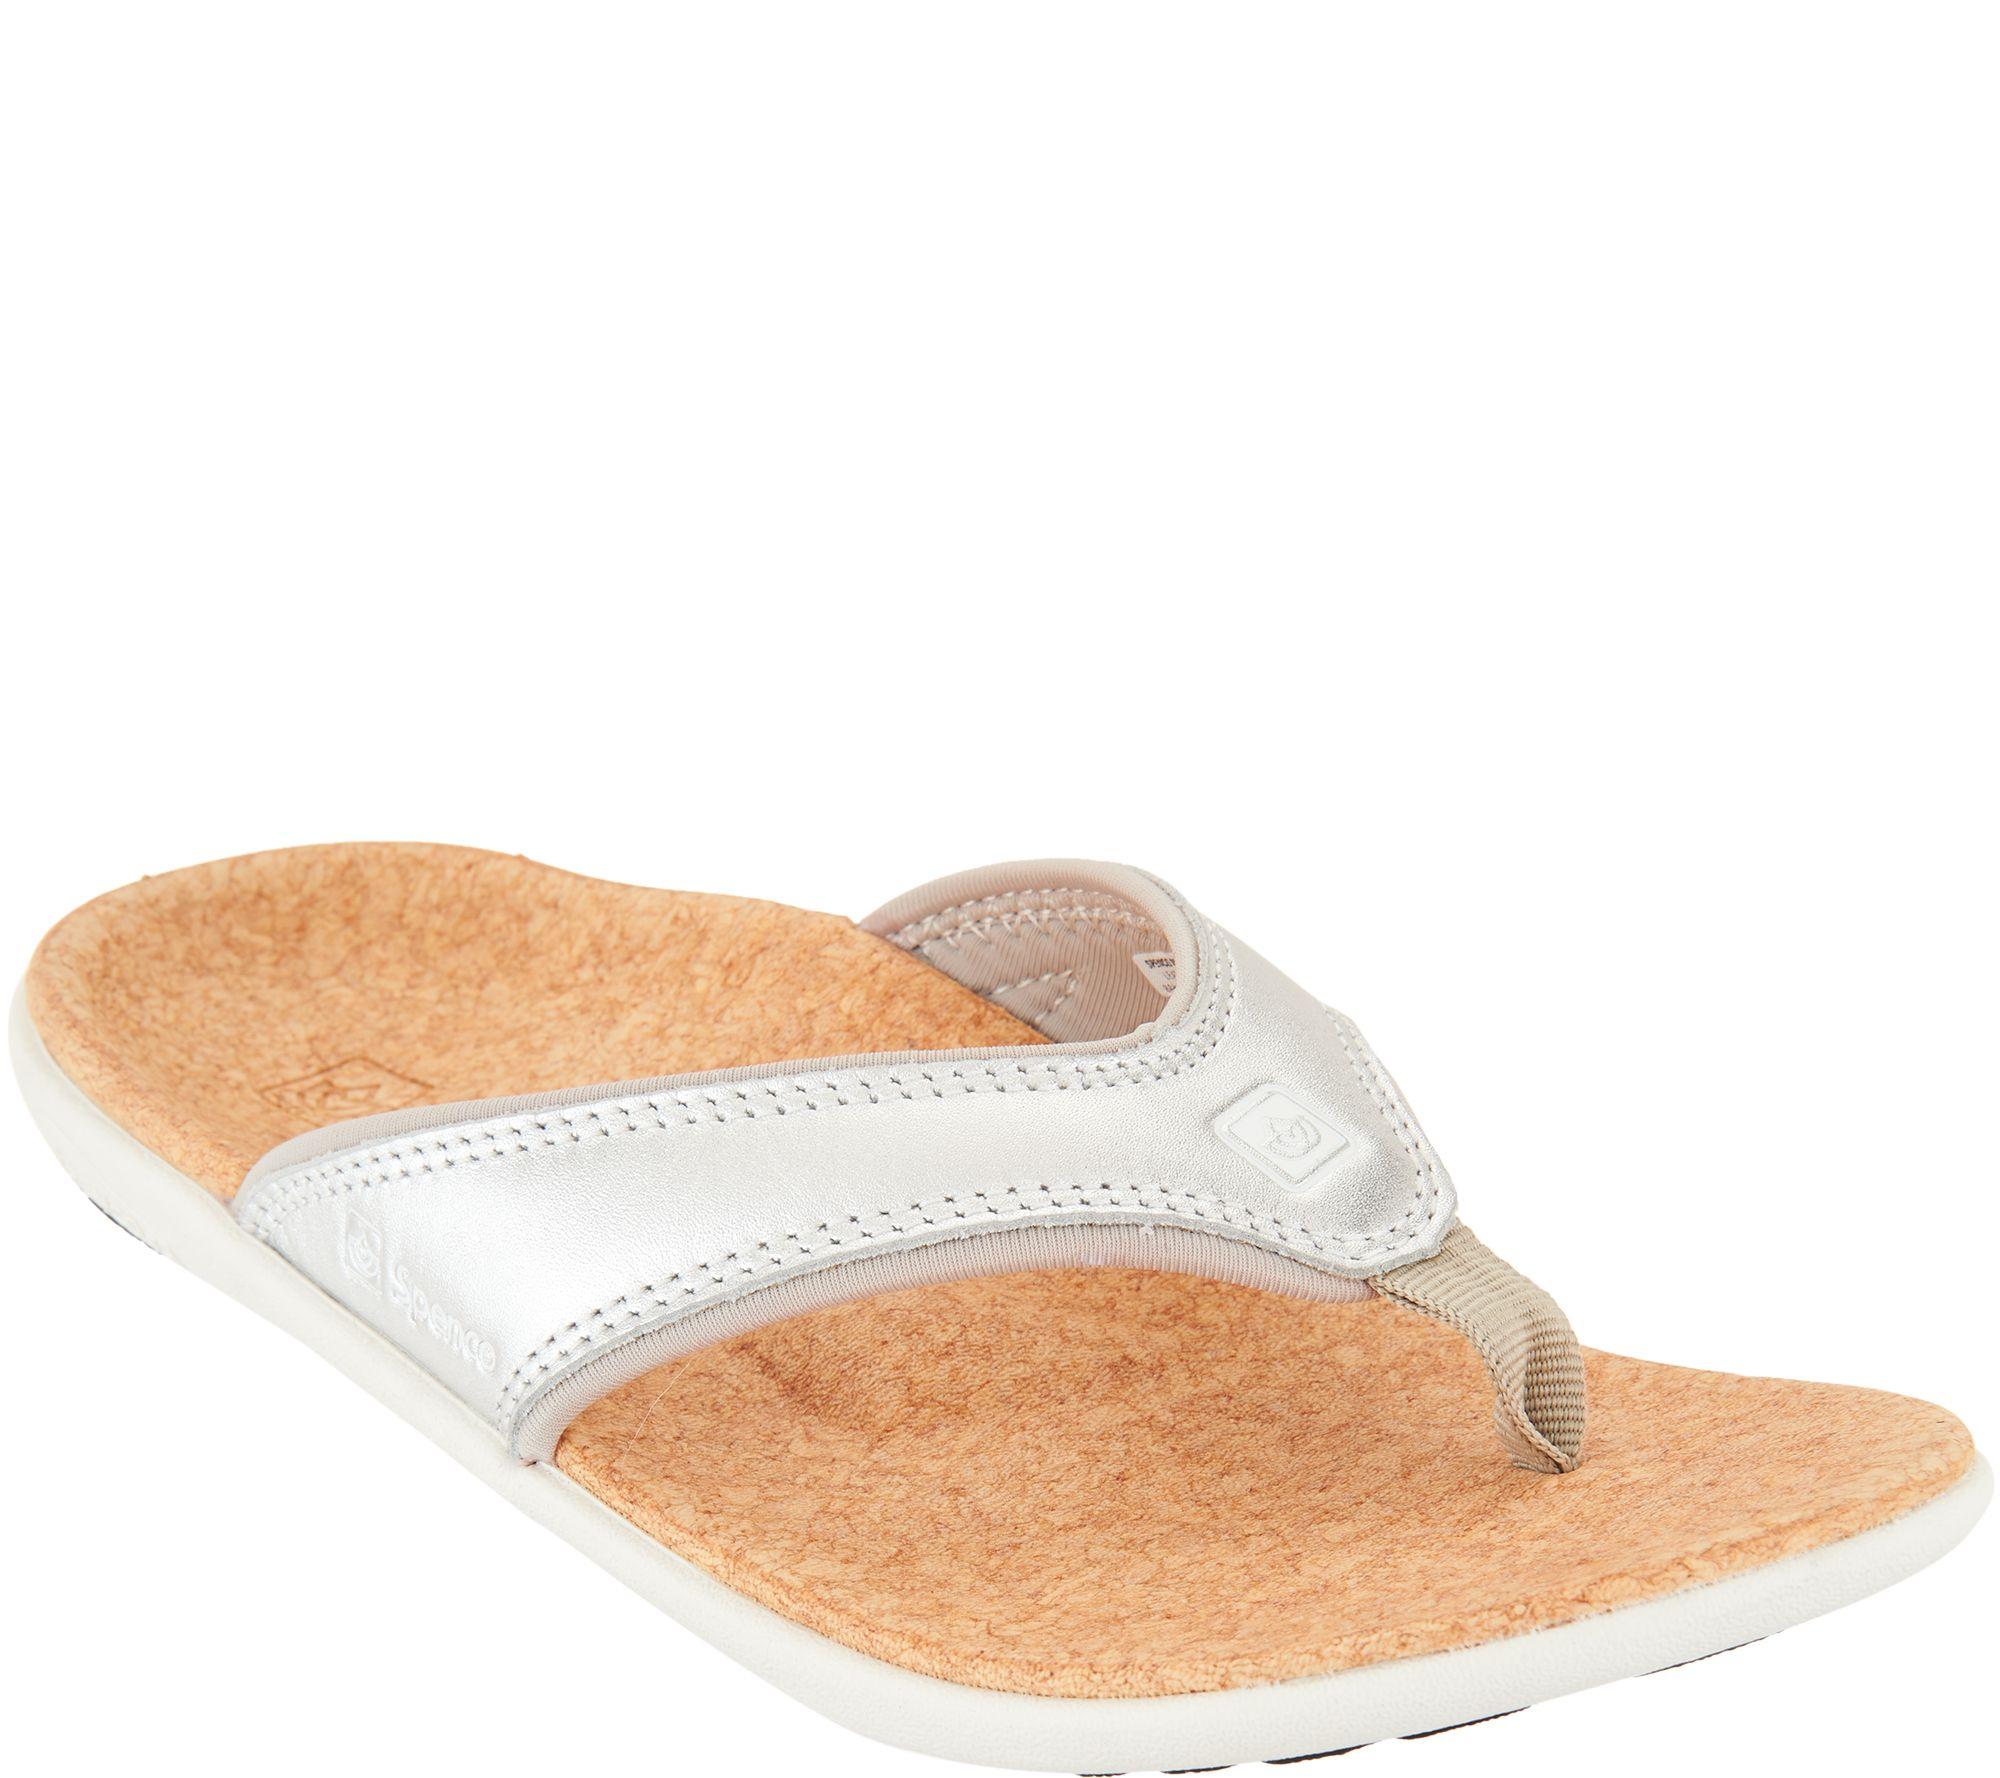 Spenco Women/'s Yumi Metallic Total Support Sandals Multiple Sizes Gold